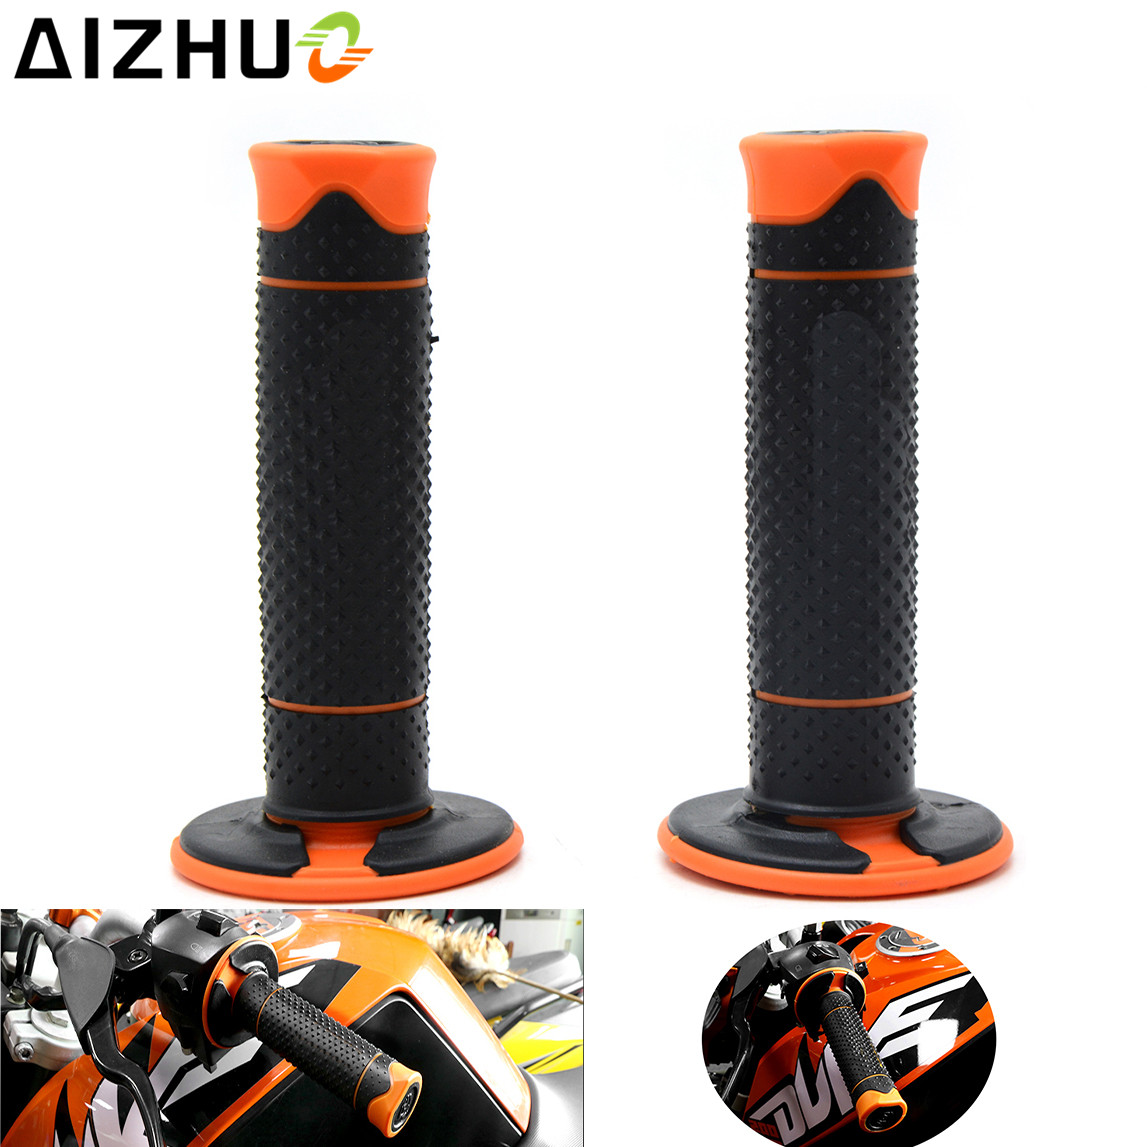 For KTM 125 200 390 Duke RC 125 200 390 RC200 RC390 RC8 RC8R 990 1290 Super Duke Motorcycle Handle Grip Rubber Handlebar Grips